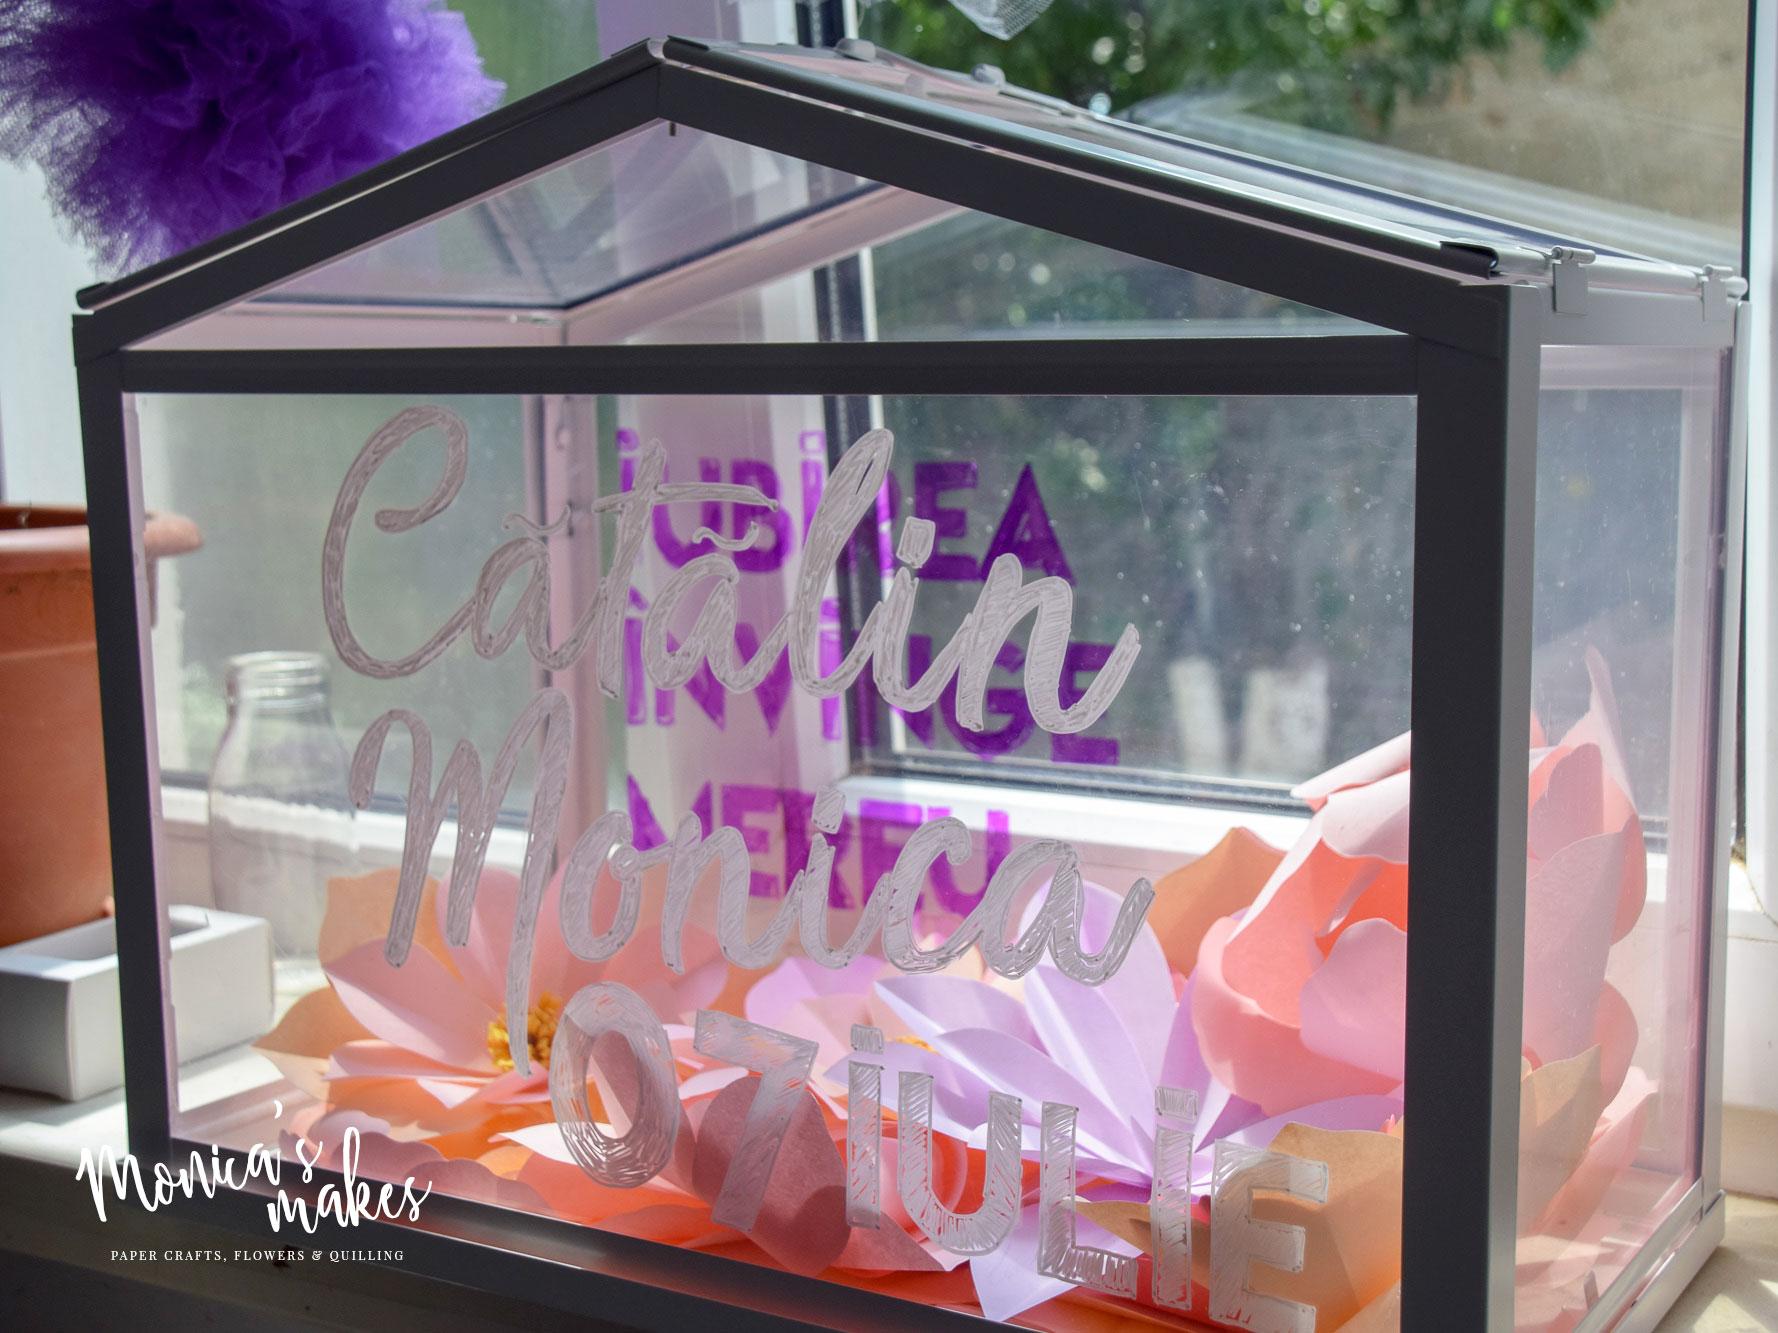 DIY Wedding Ideas: Making a Money Box out of an IKEA Green House - See the tutorial at www.monicabadiu.com